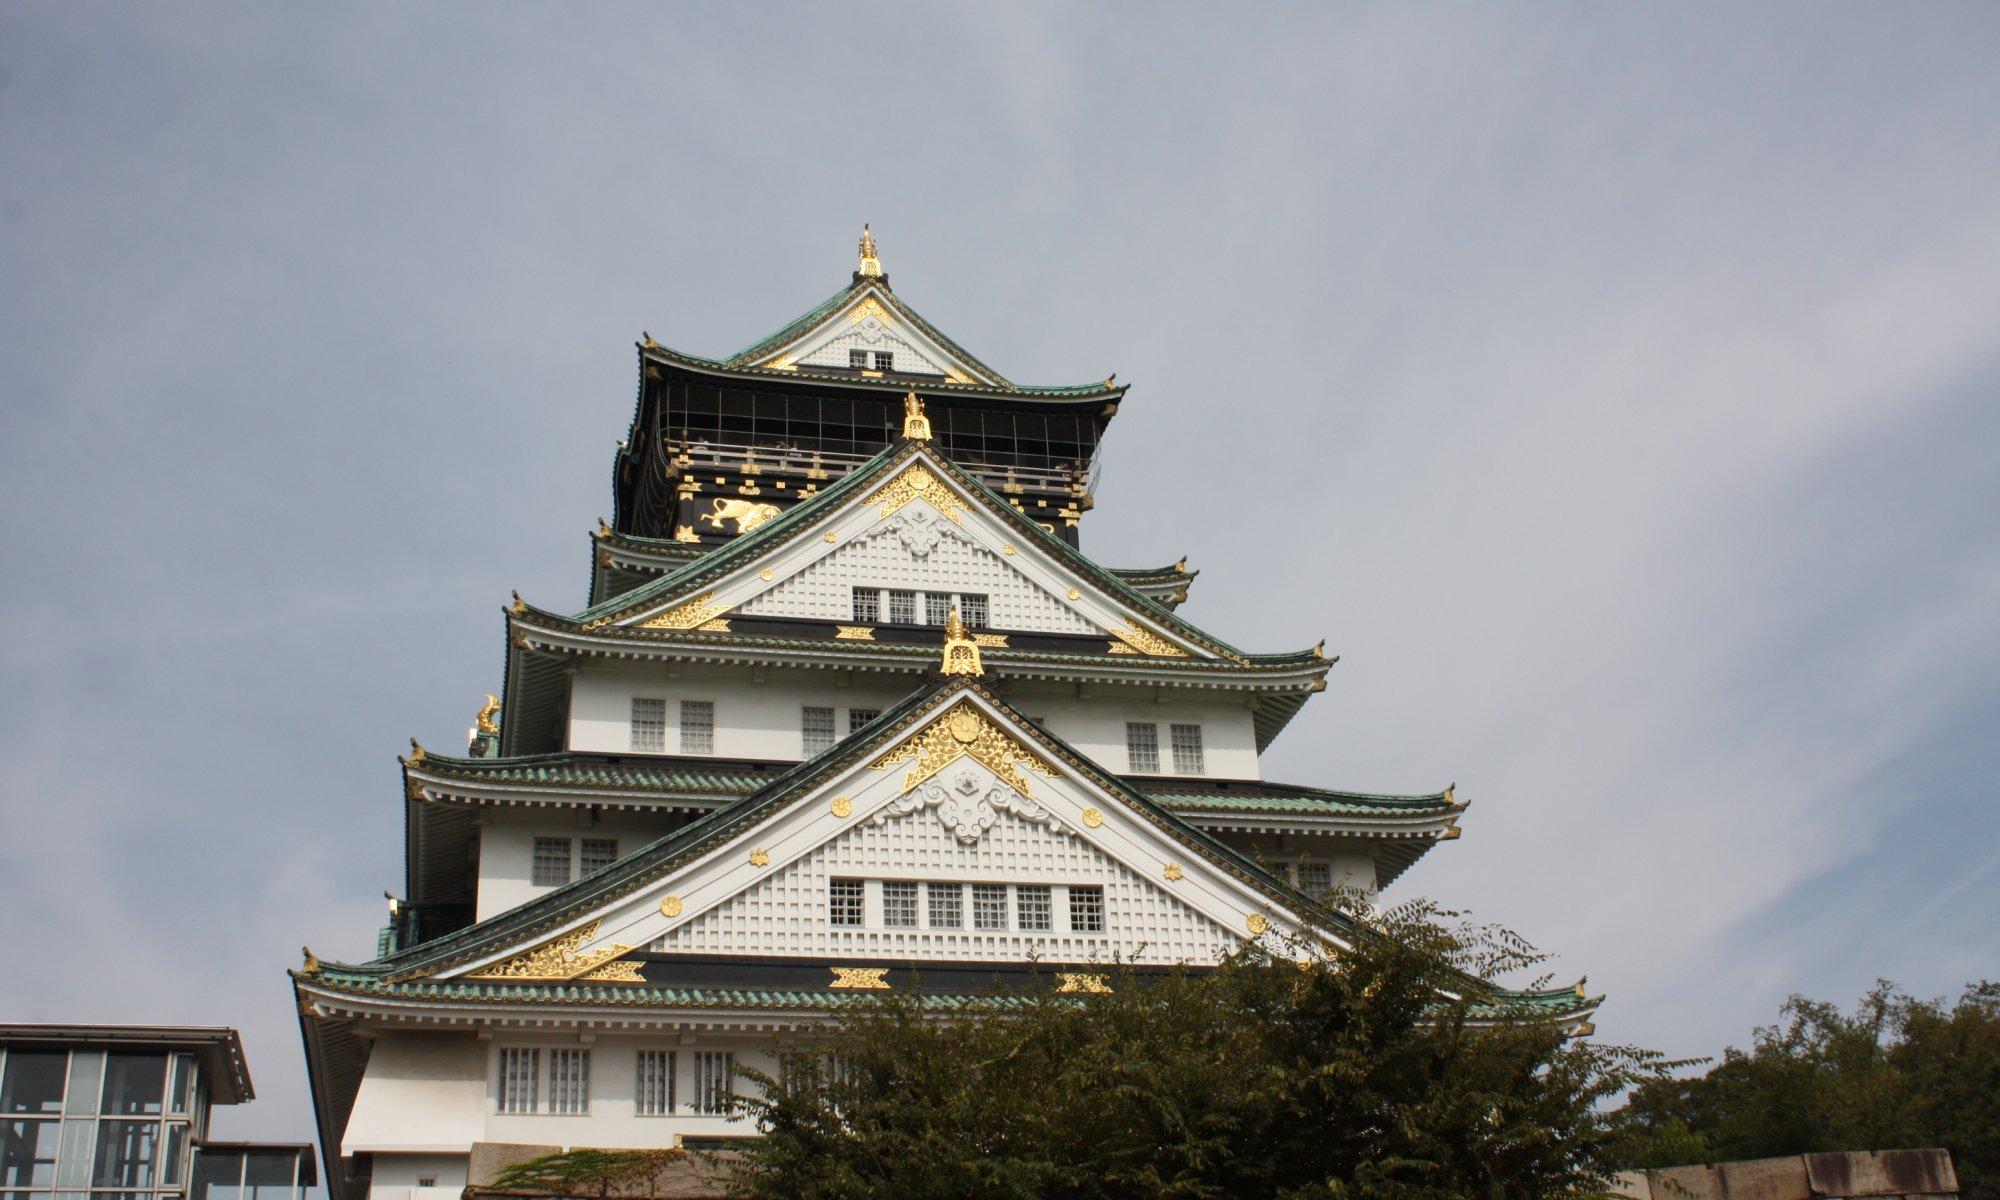 Ōsaka-jō, Ōsaka, Japan